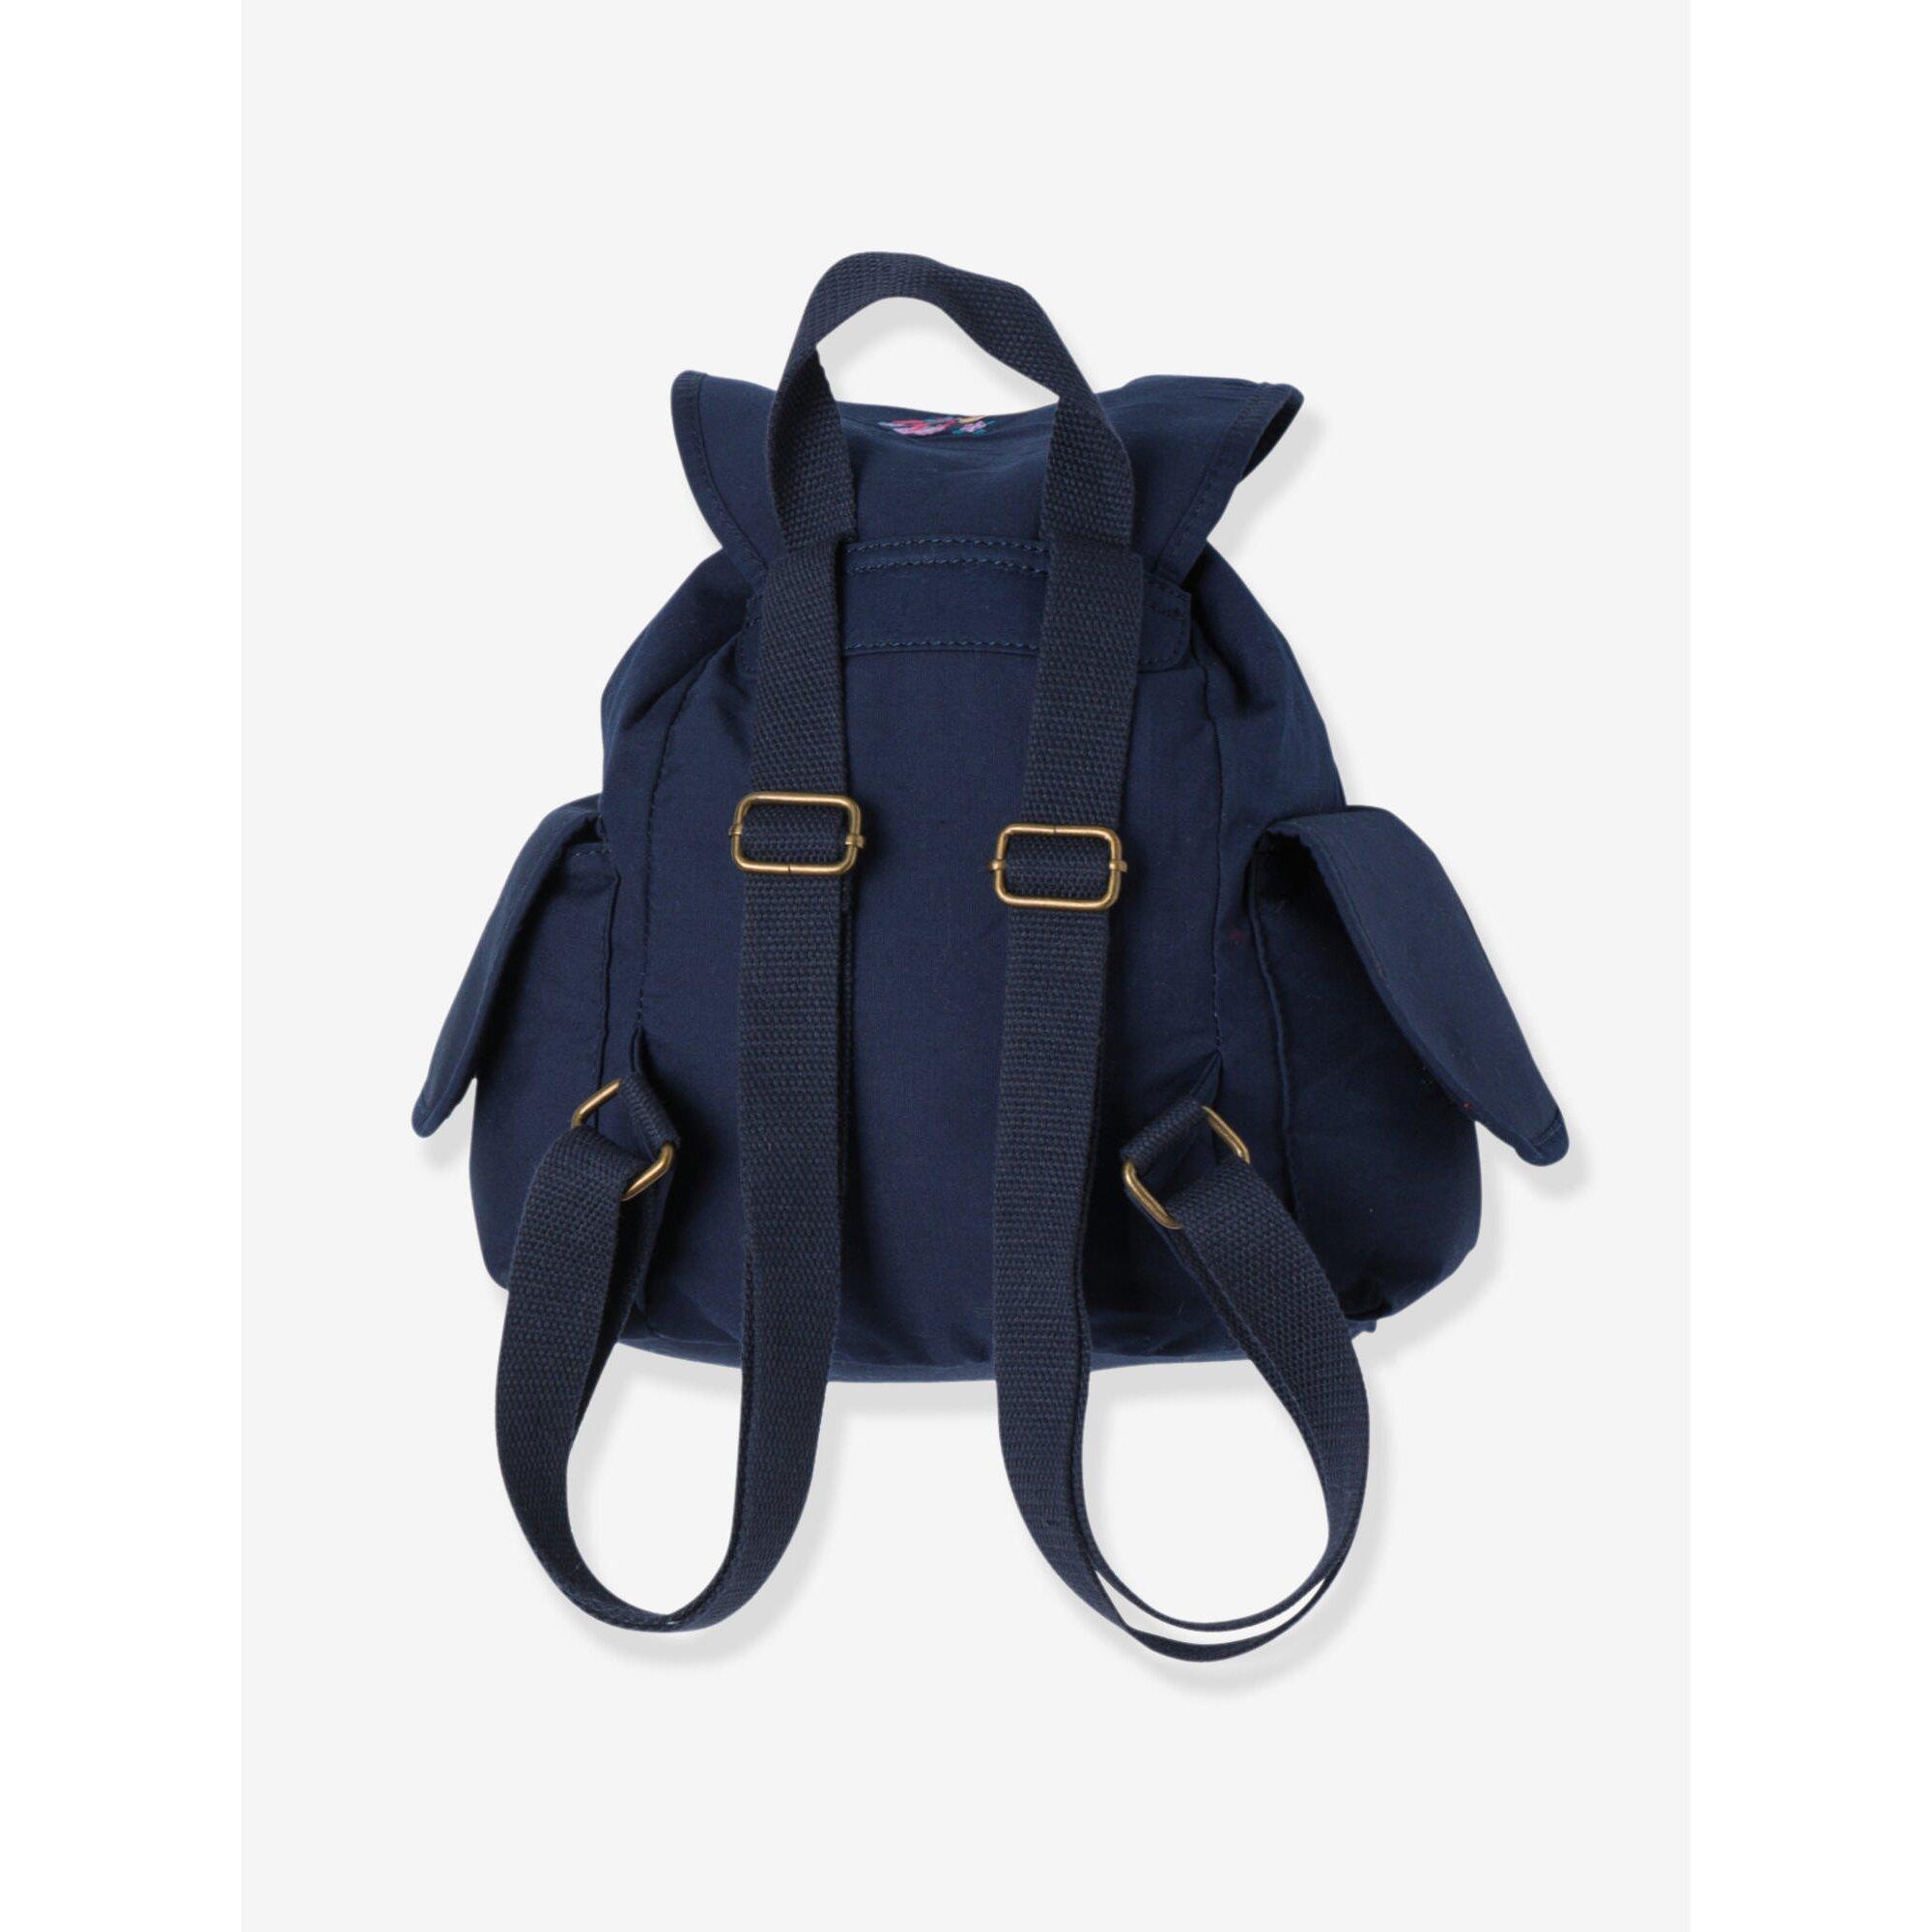 vertbaudet-bestickter-rucksack-fur-madchen, 25.99 EUR @ babywalz-de